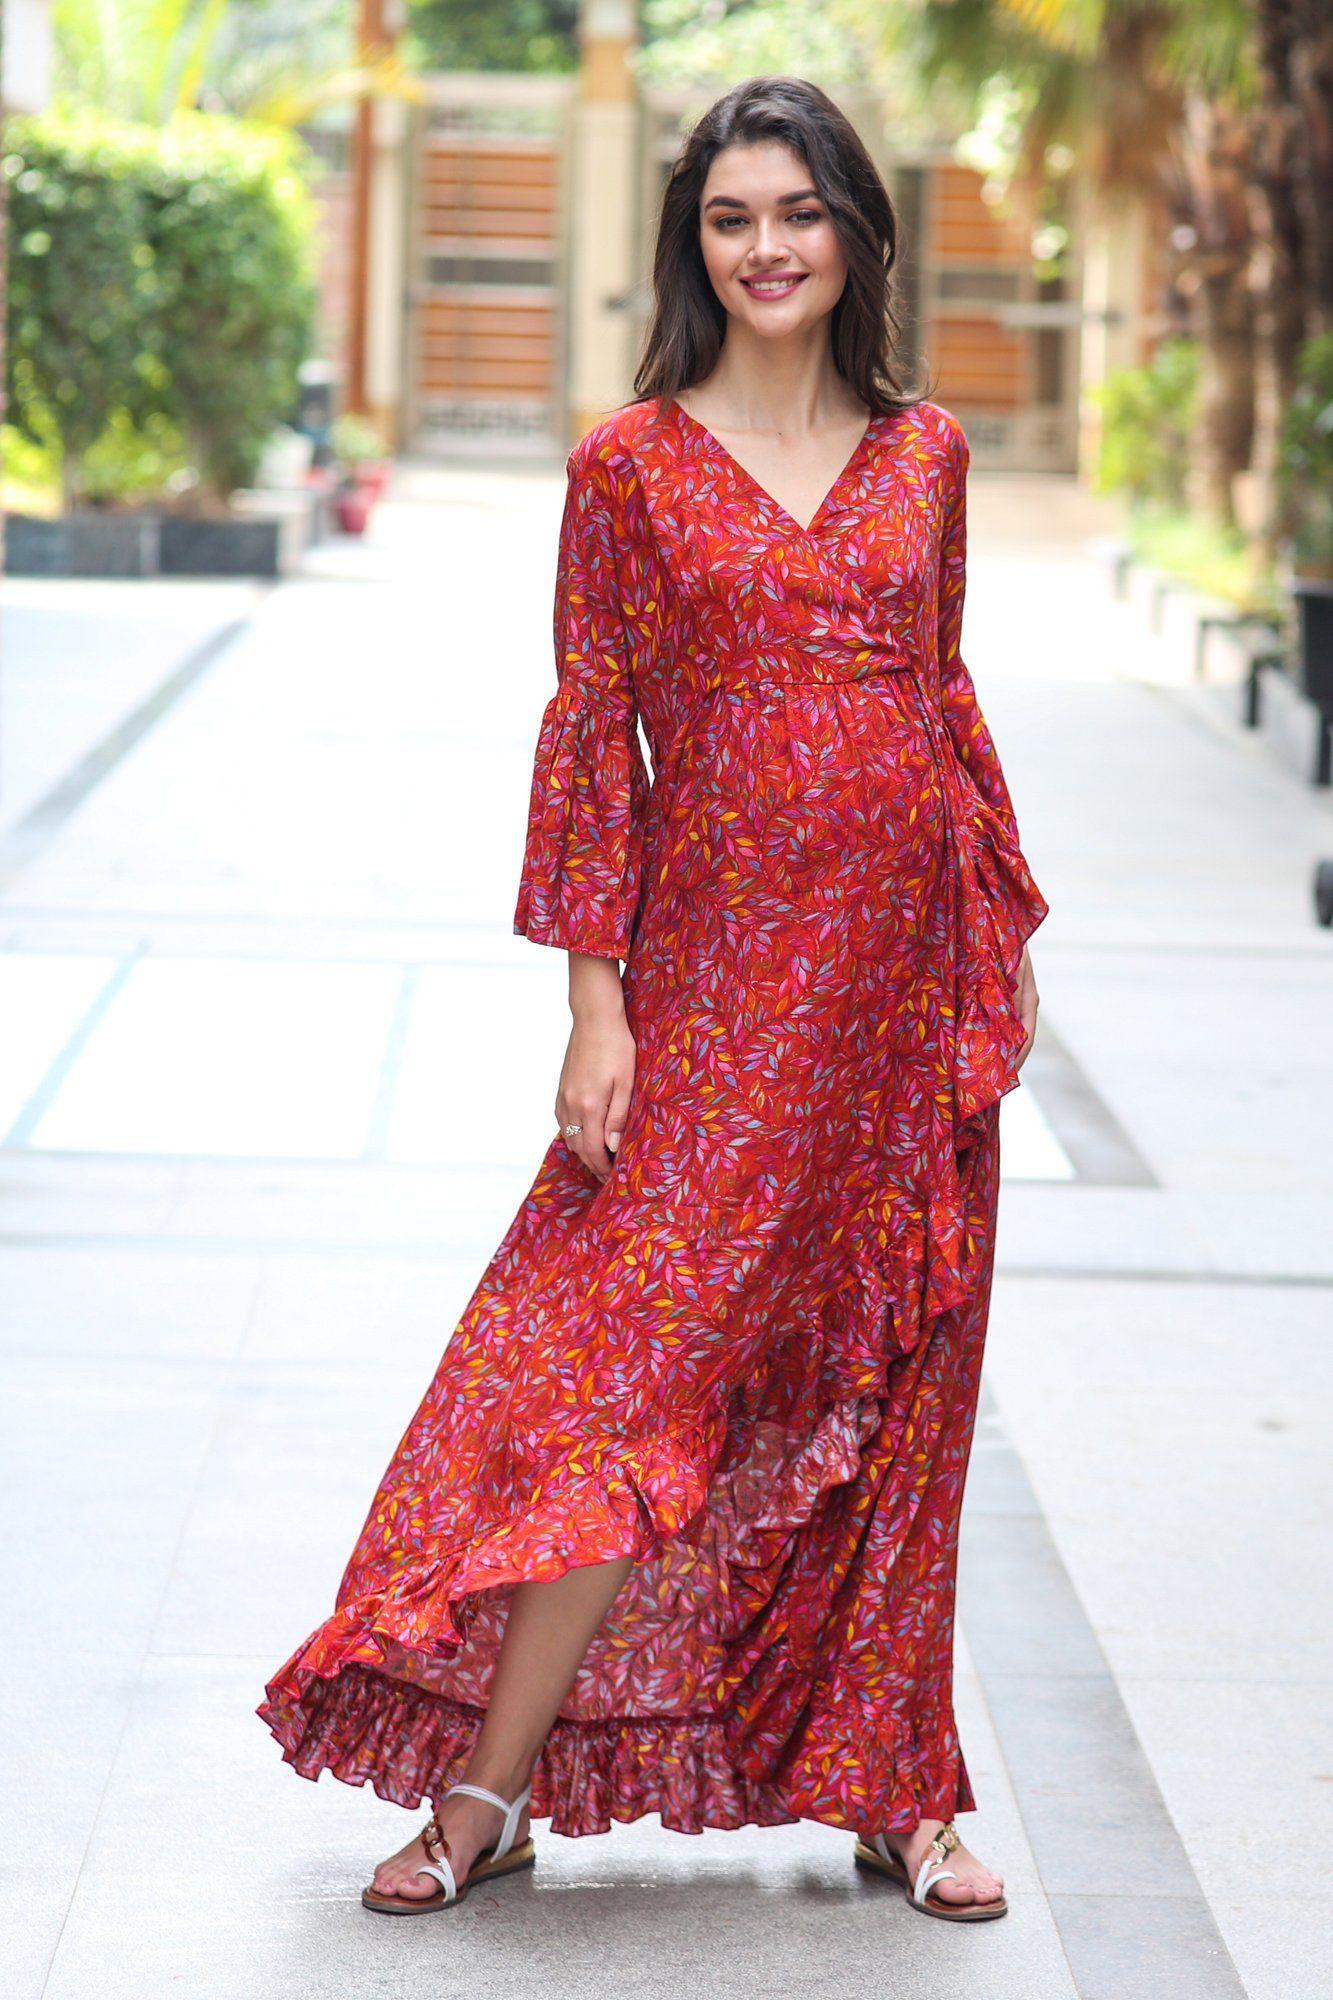 Crimson Frill Maternity Nursing Wrap Dress Wrap Dress Dresses Womens Dresses [ 2000 x 1333 Pixel ]